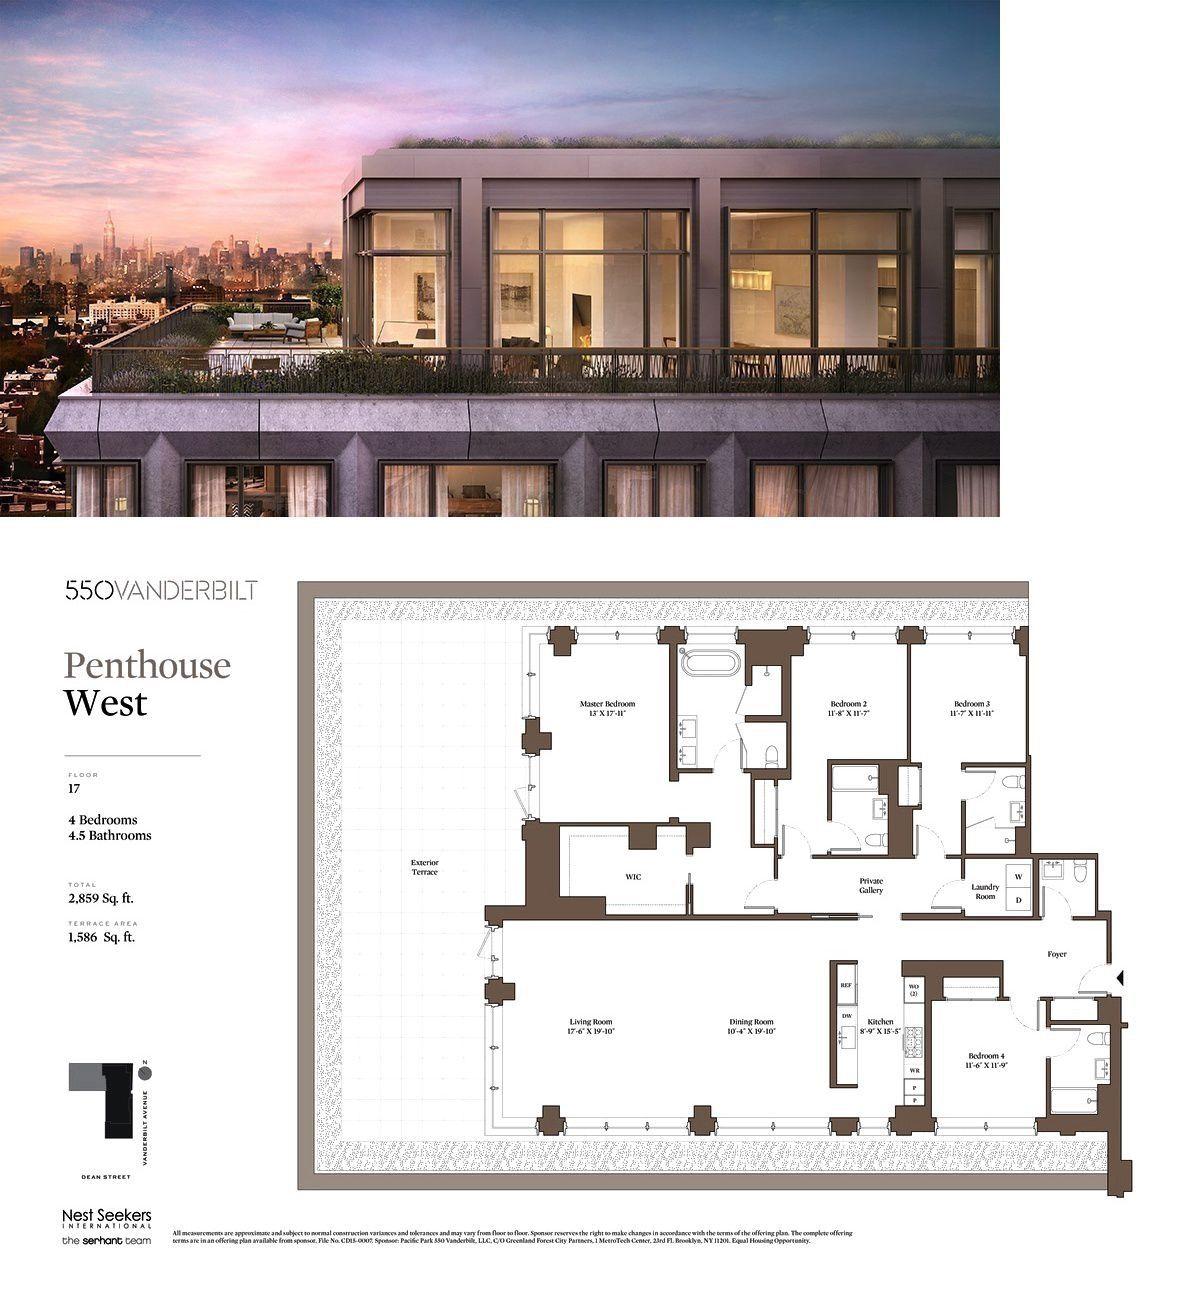 550 Vanderbilt Avenue Phw In Prospect Heights Brooklyn Streeteasy Penthouse Apartment Floor Plan Mansion Floor Plan Architectural Floor Plans